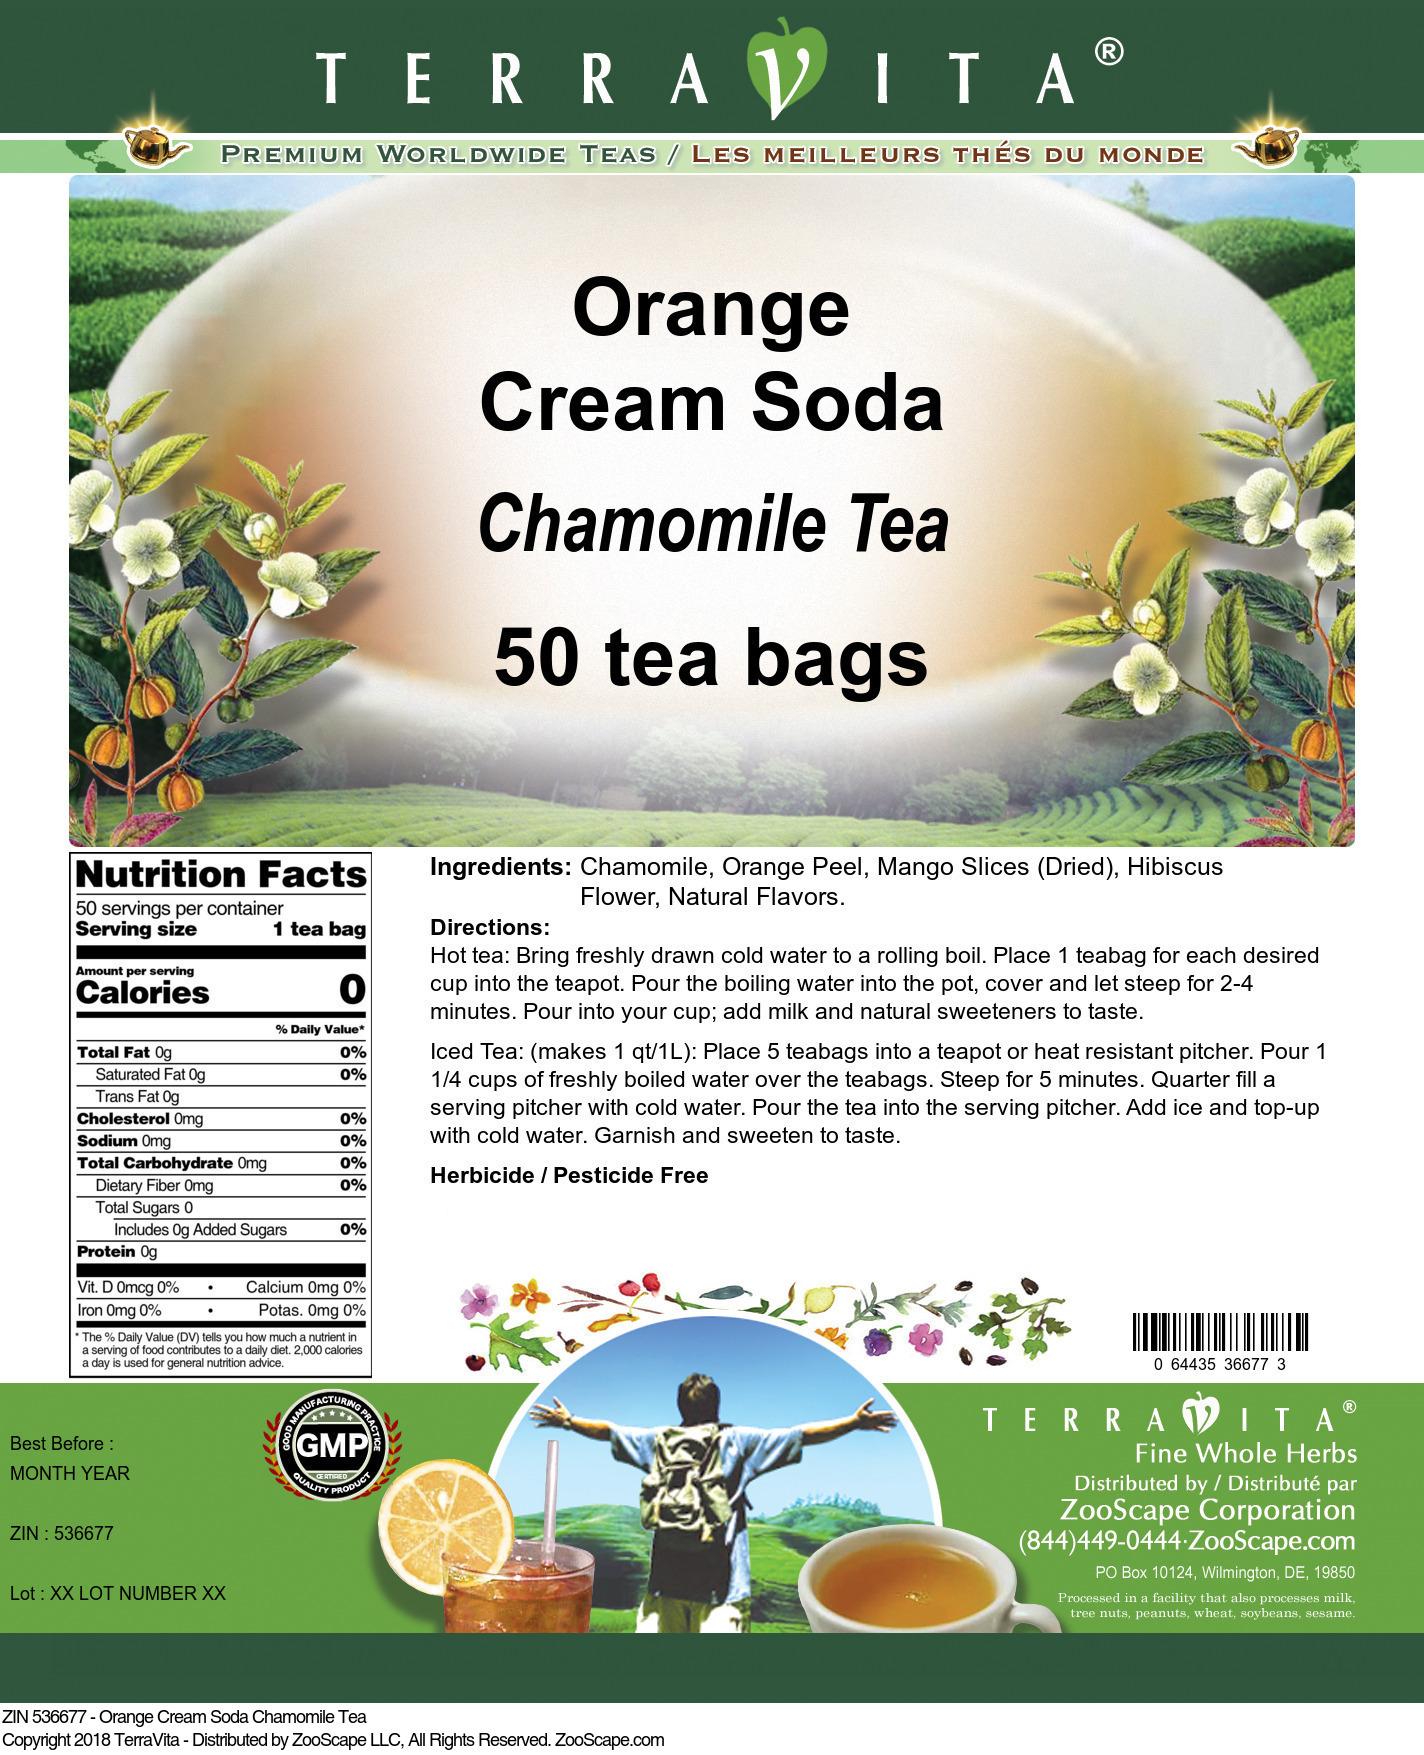 Orange Cream Soda Chamomile Tea